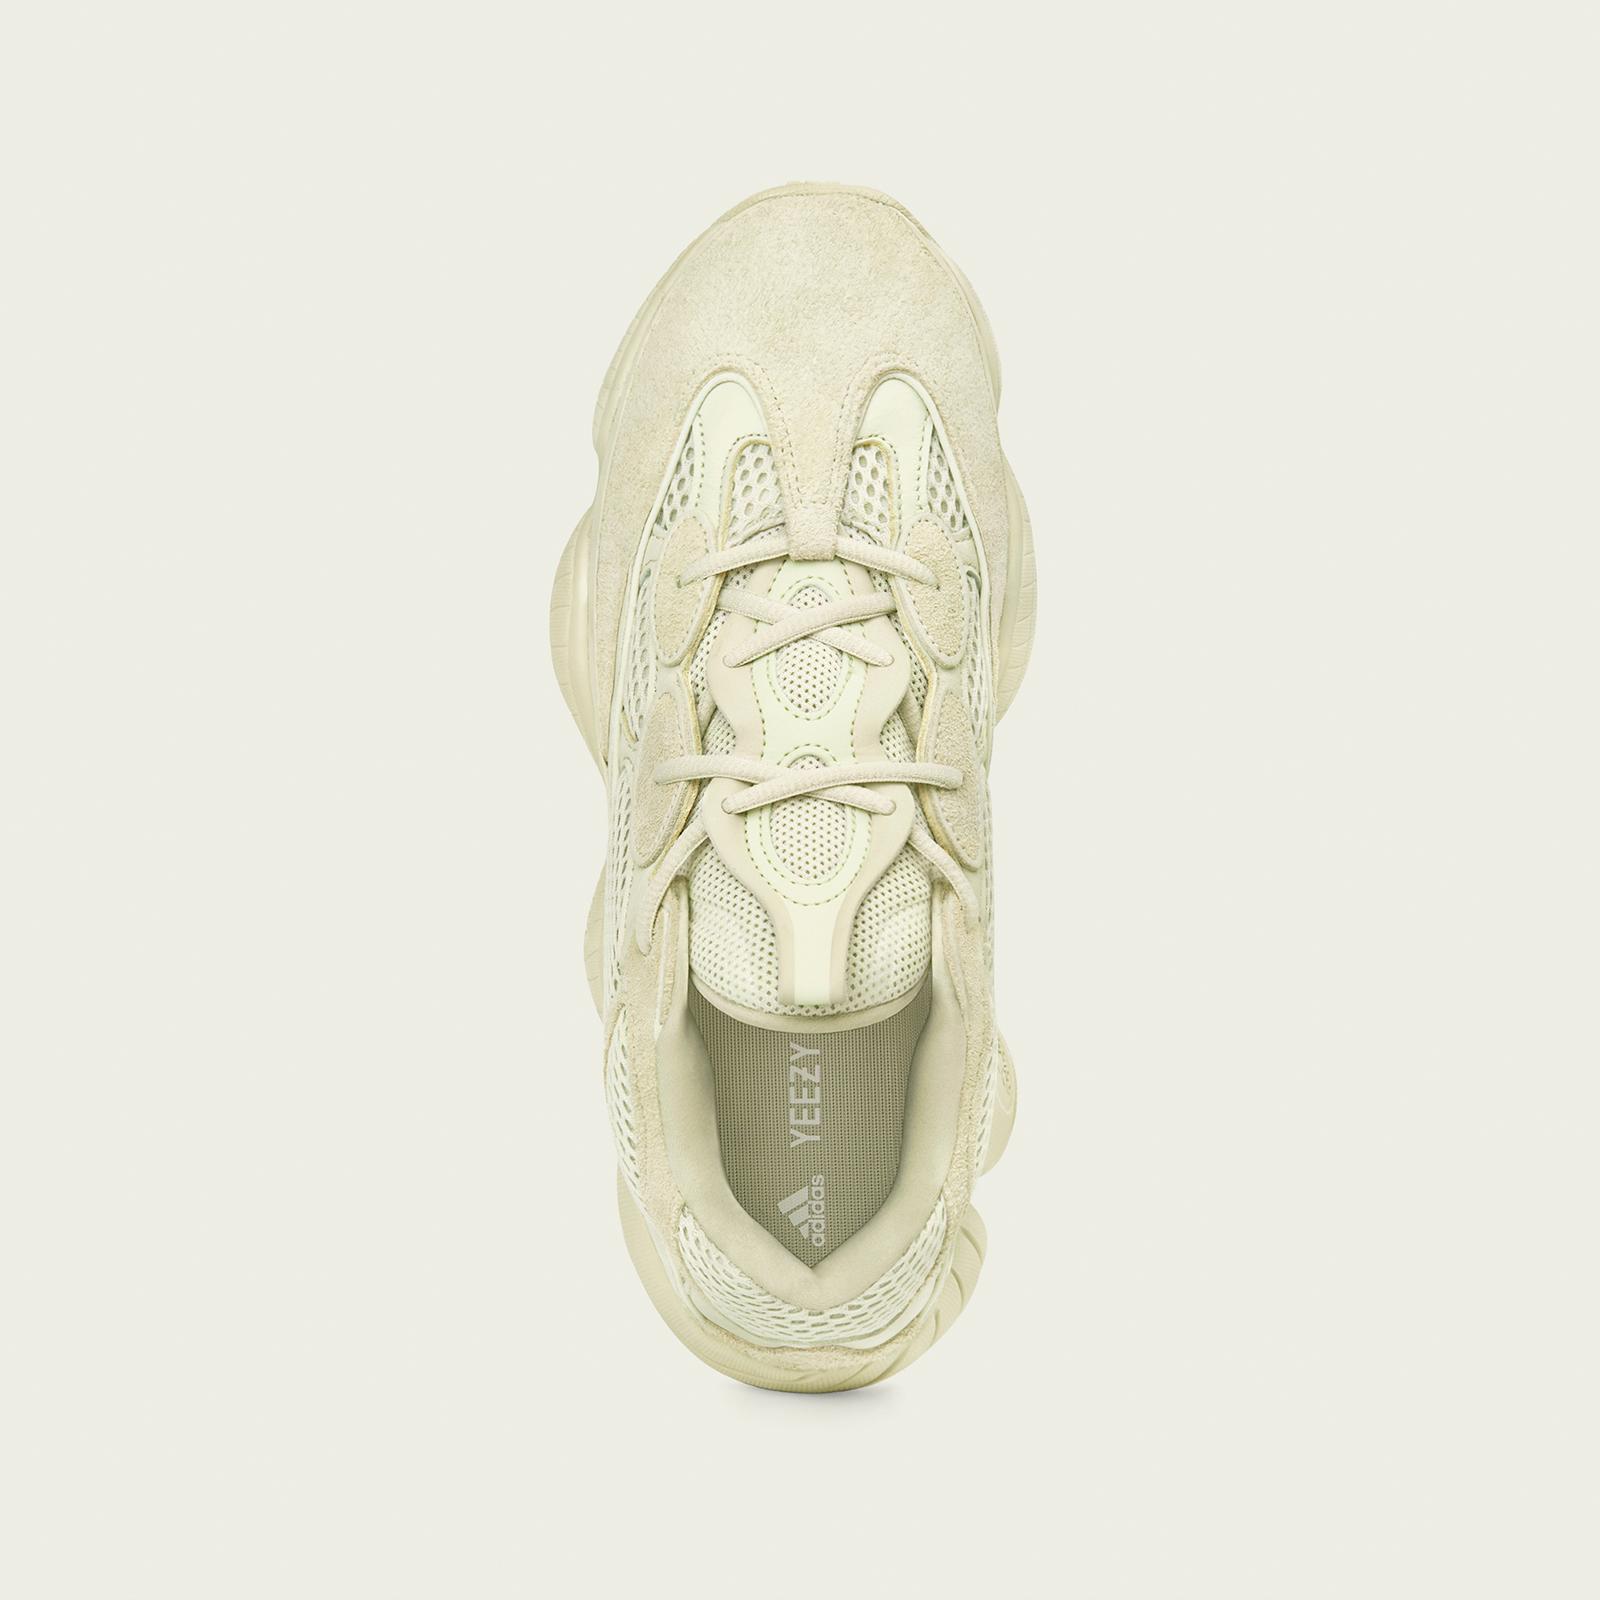 9243787b00d59 adidas Yeezy 500 - Db2966 - Sneakersnstuff